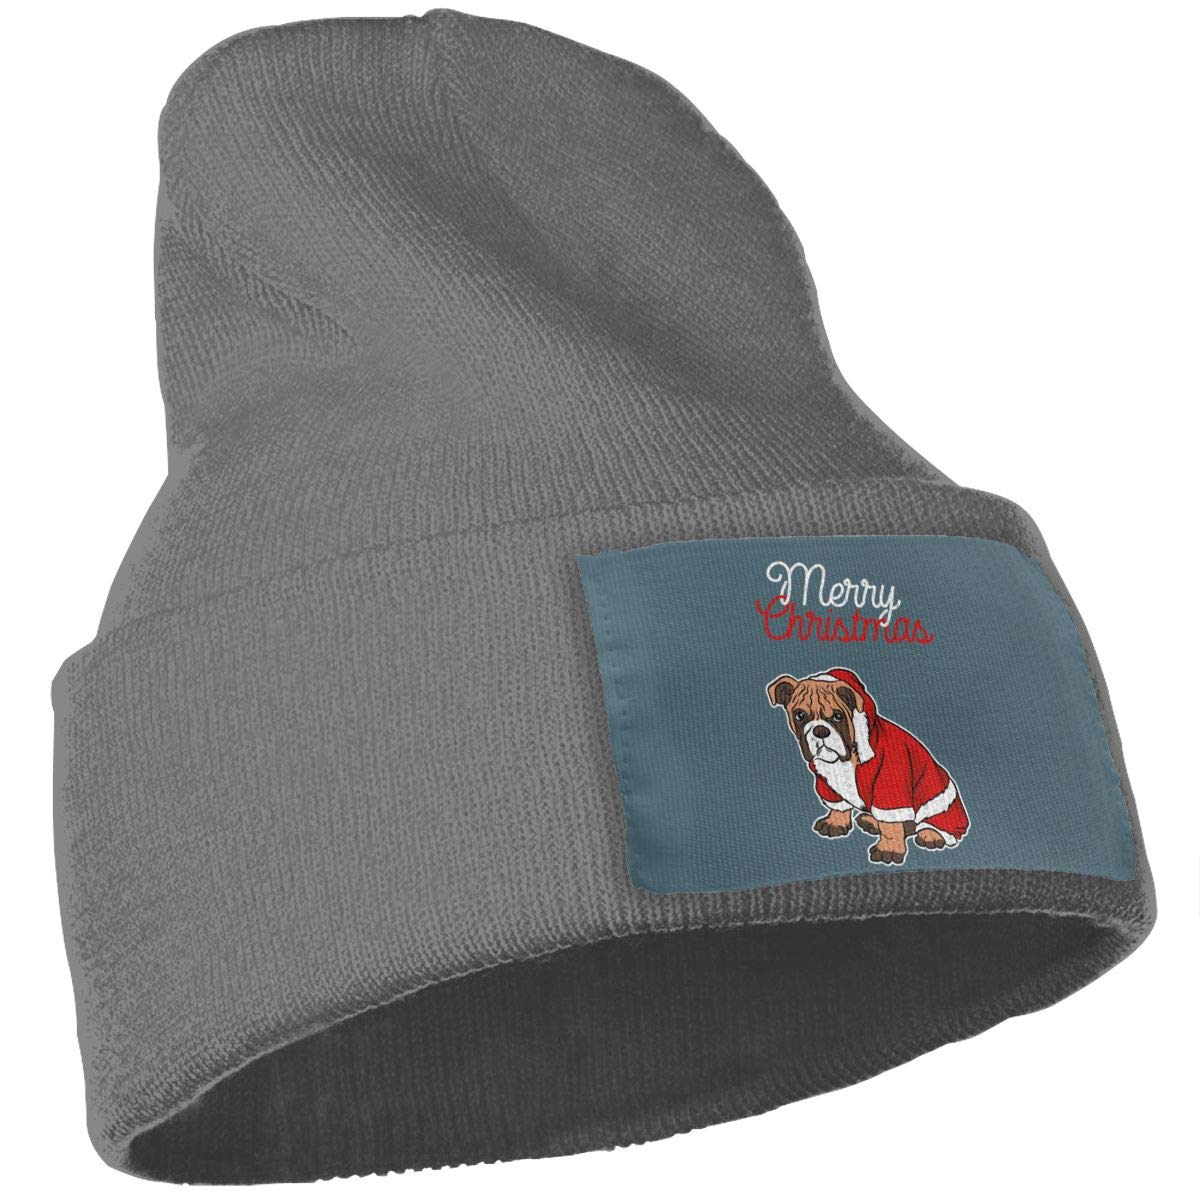 Poii Qon Merry Christmas Bulldog Beanies Hat Wool Skull Caps for Woman Man